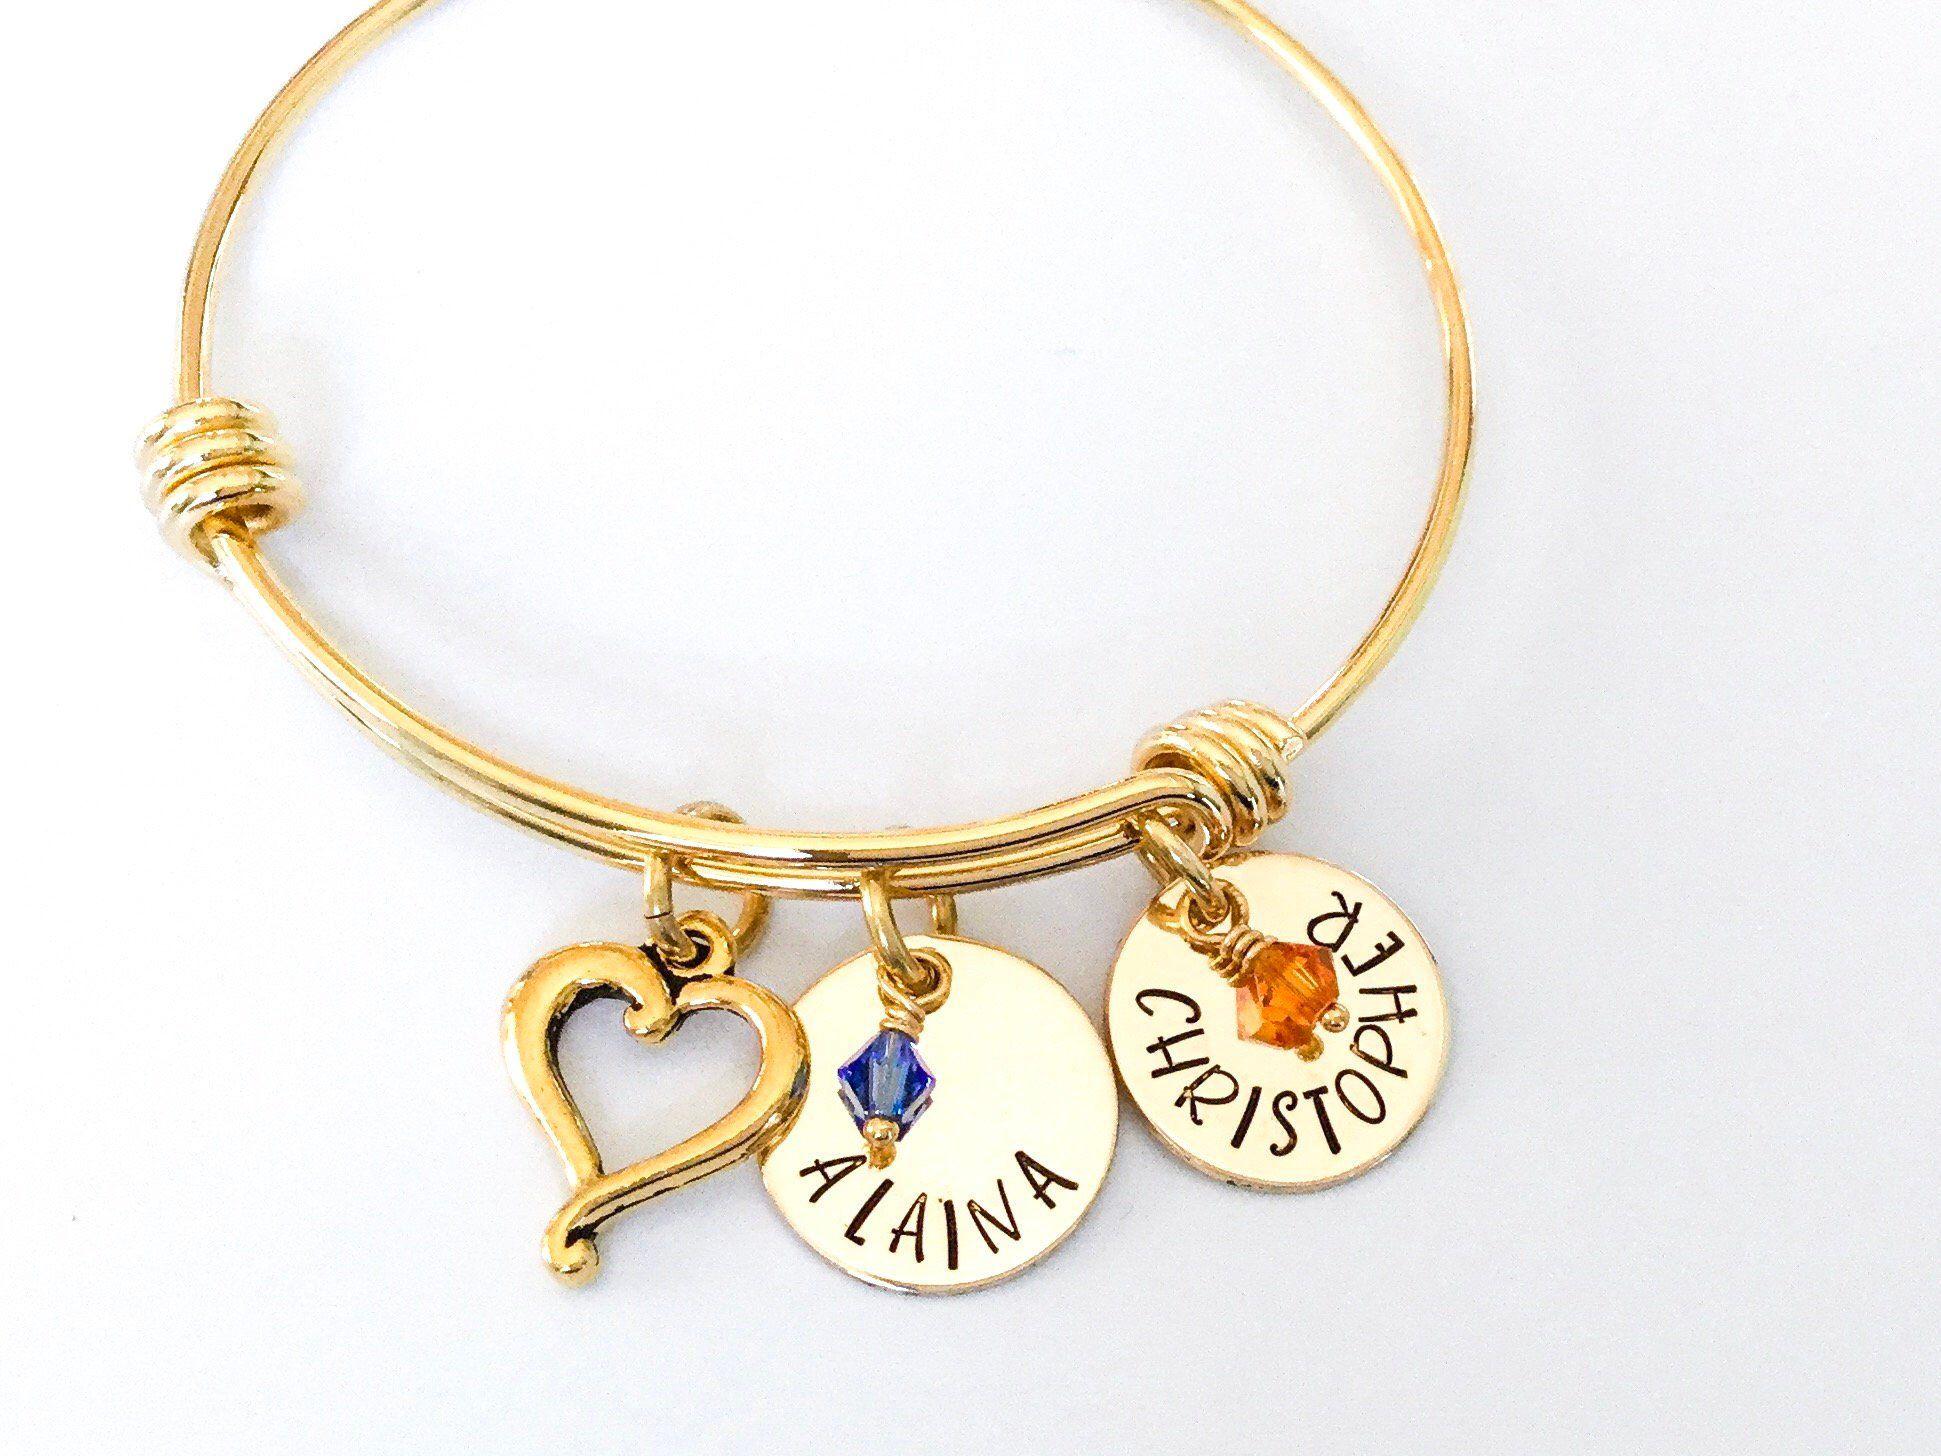 Personalised Custom Name Charm Bracelet Mom Grandma Birthstones Silver Gold Expandable Bracelet Stainles Moms Bracelet Personalized Gifts For Mom Gifts For Mom